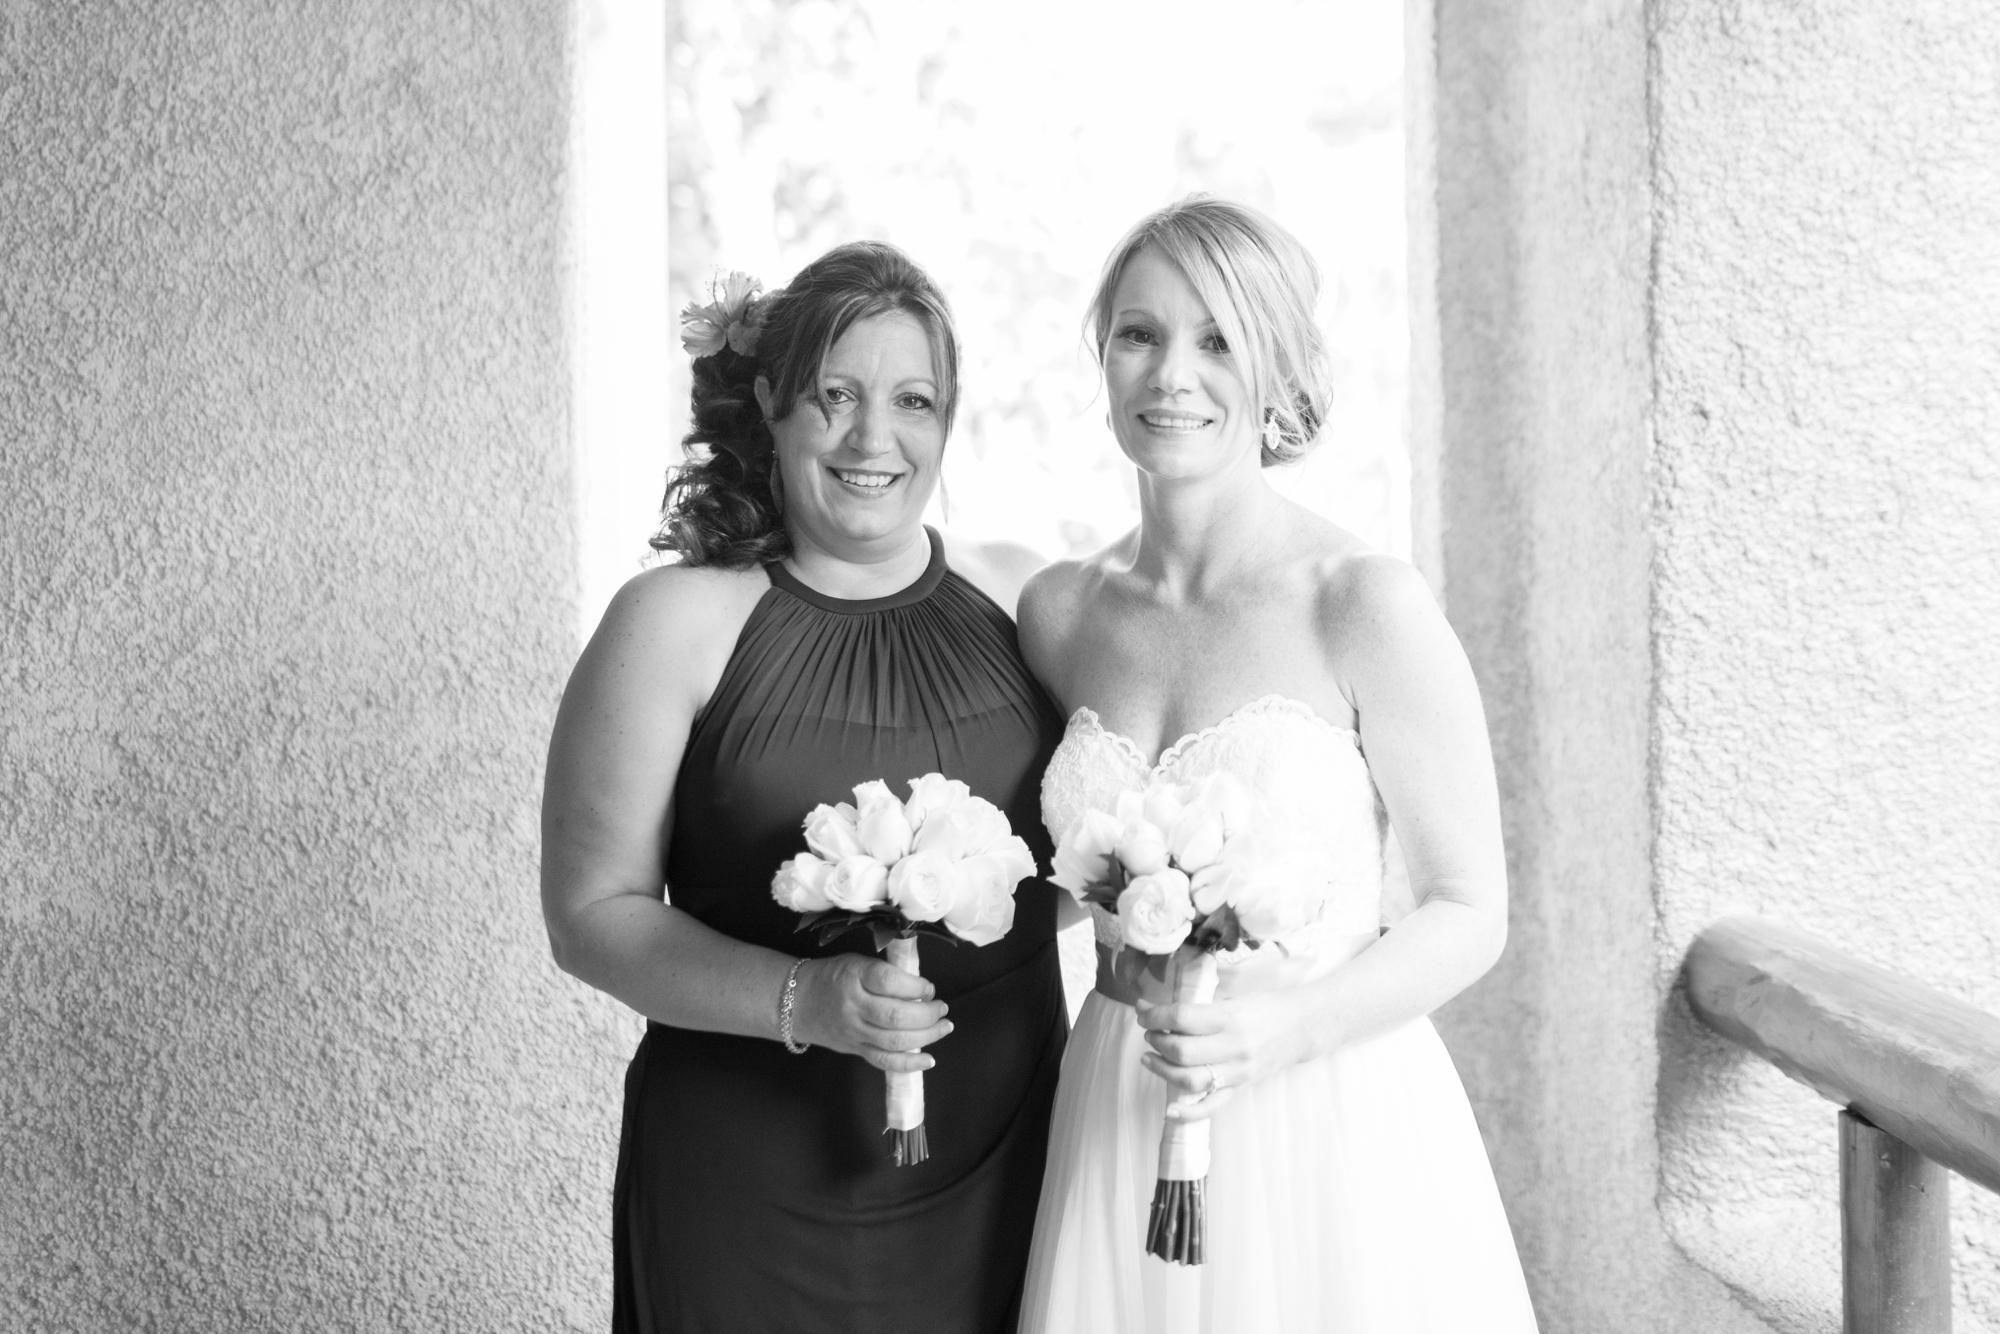 Morosoff Wedding 1-Getting Ready-91_anna grace photography destination wedding photographer playa del carmen mexico photo.jpg